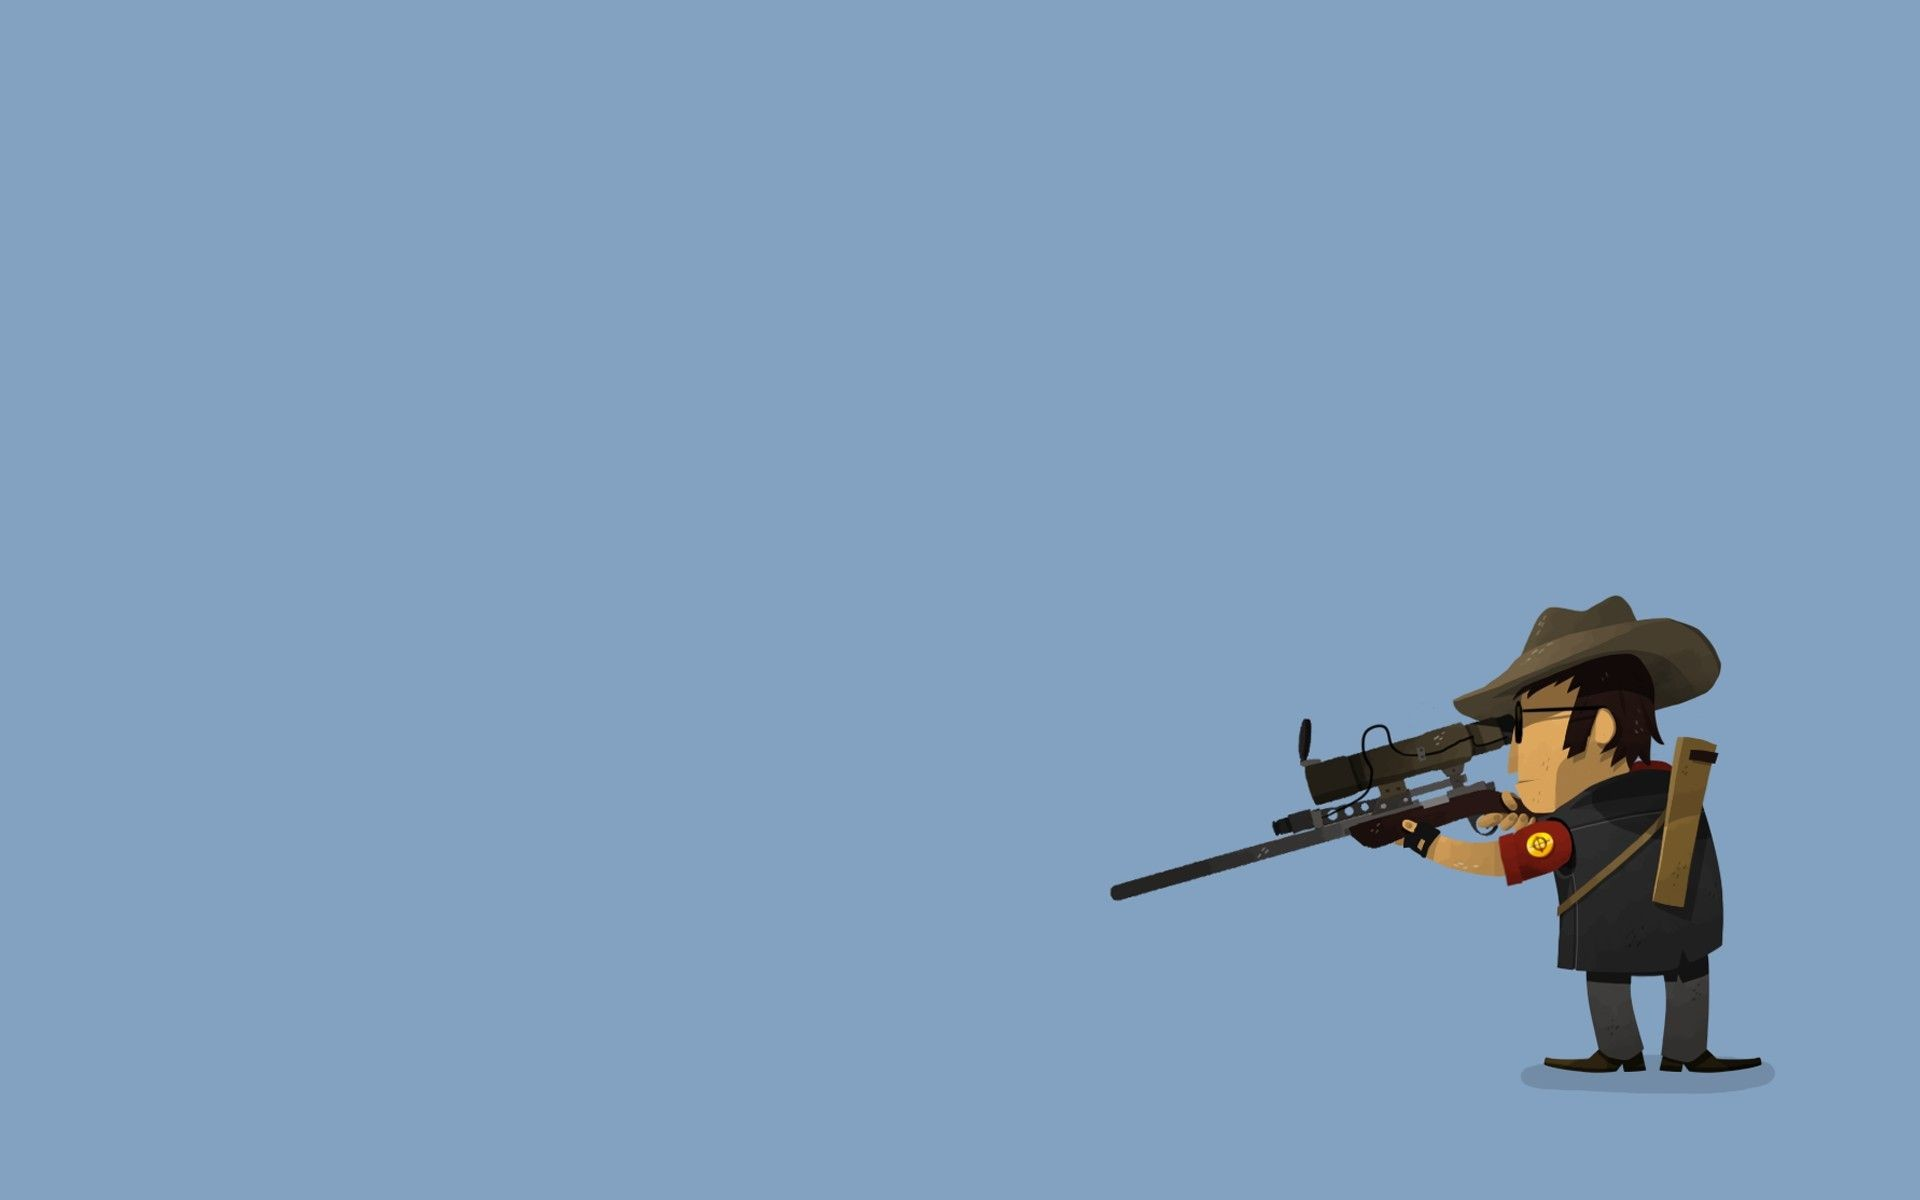 Video games team fortress 2 sniper tf2 wallpaper